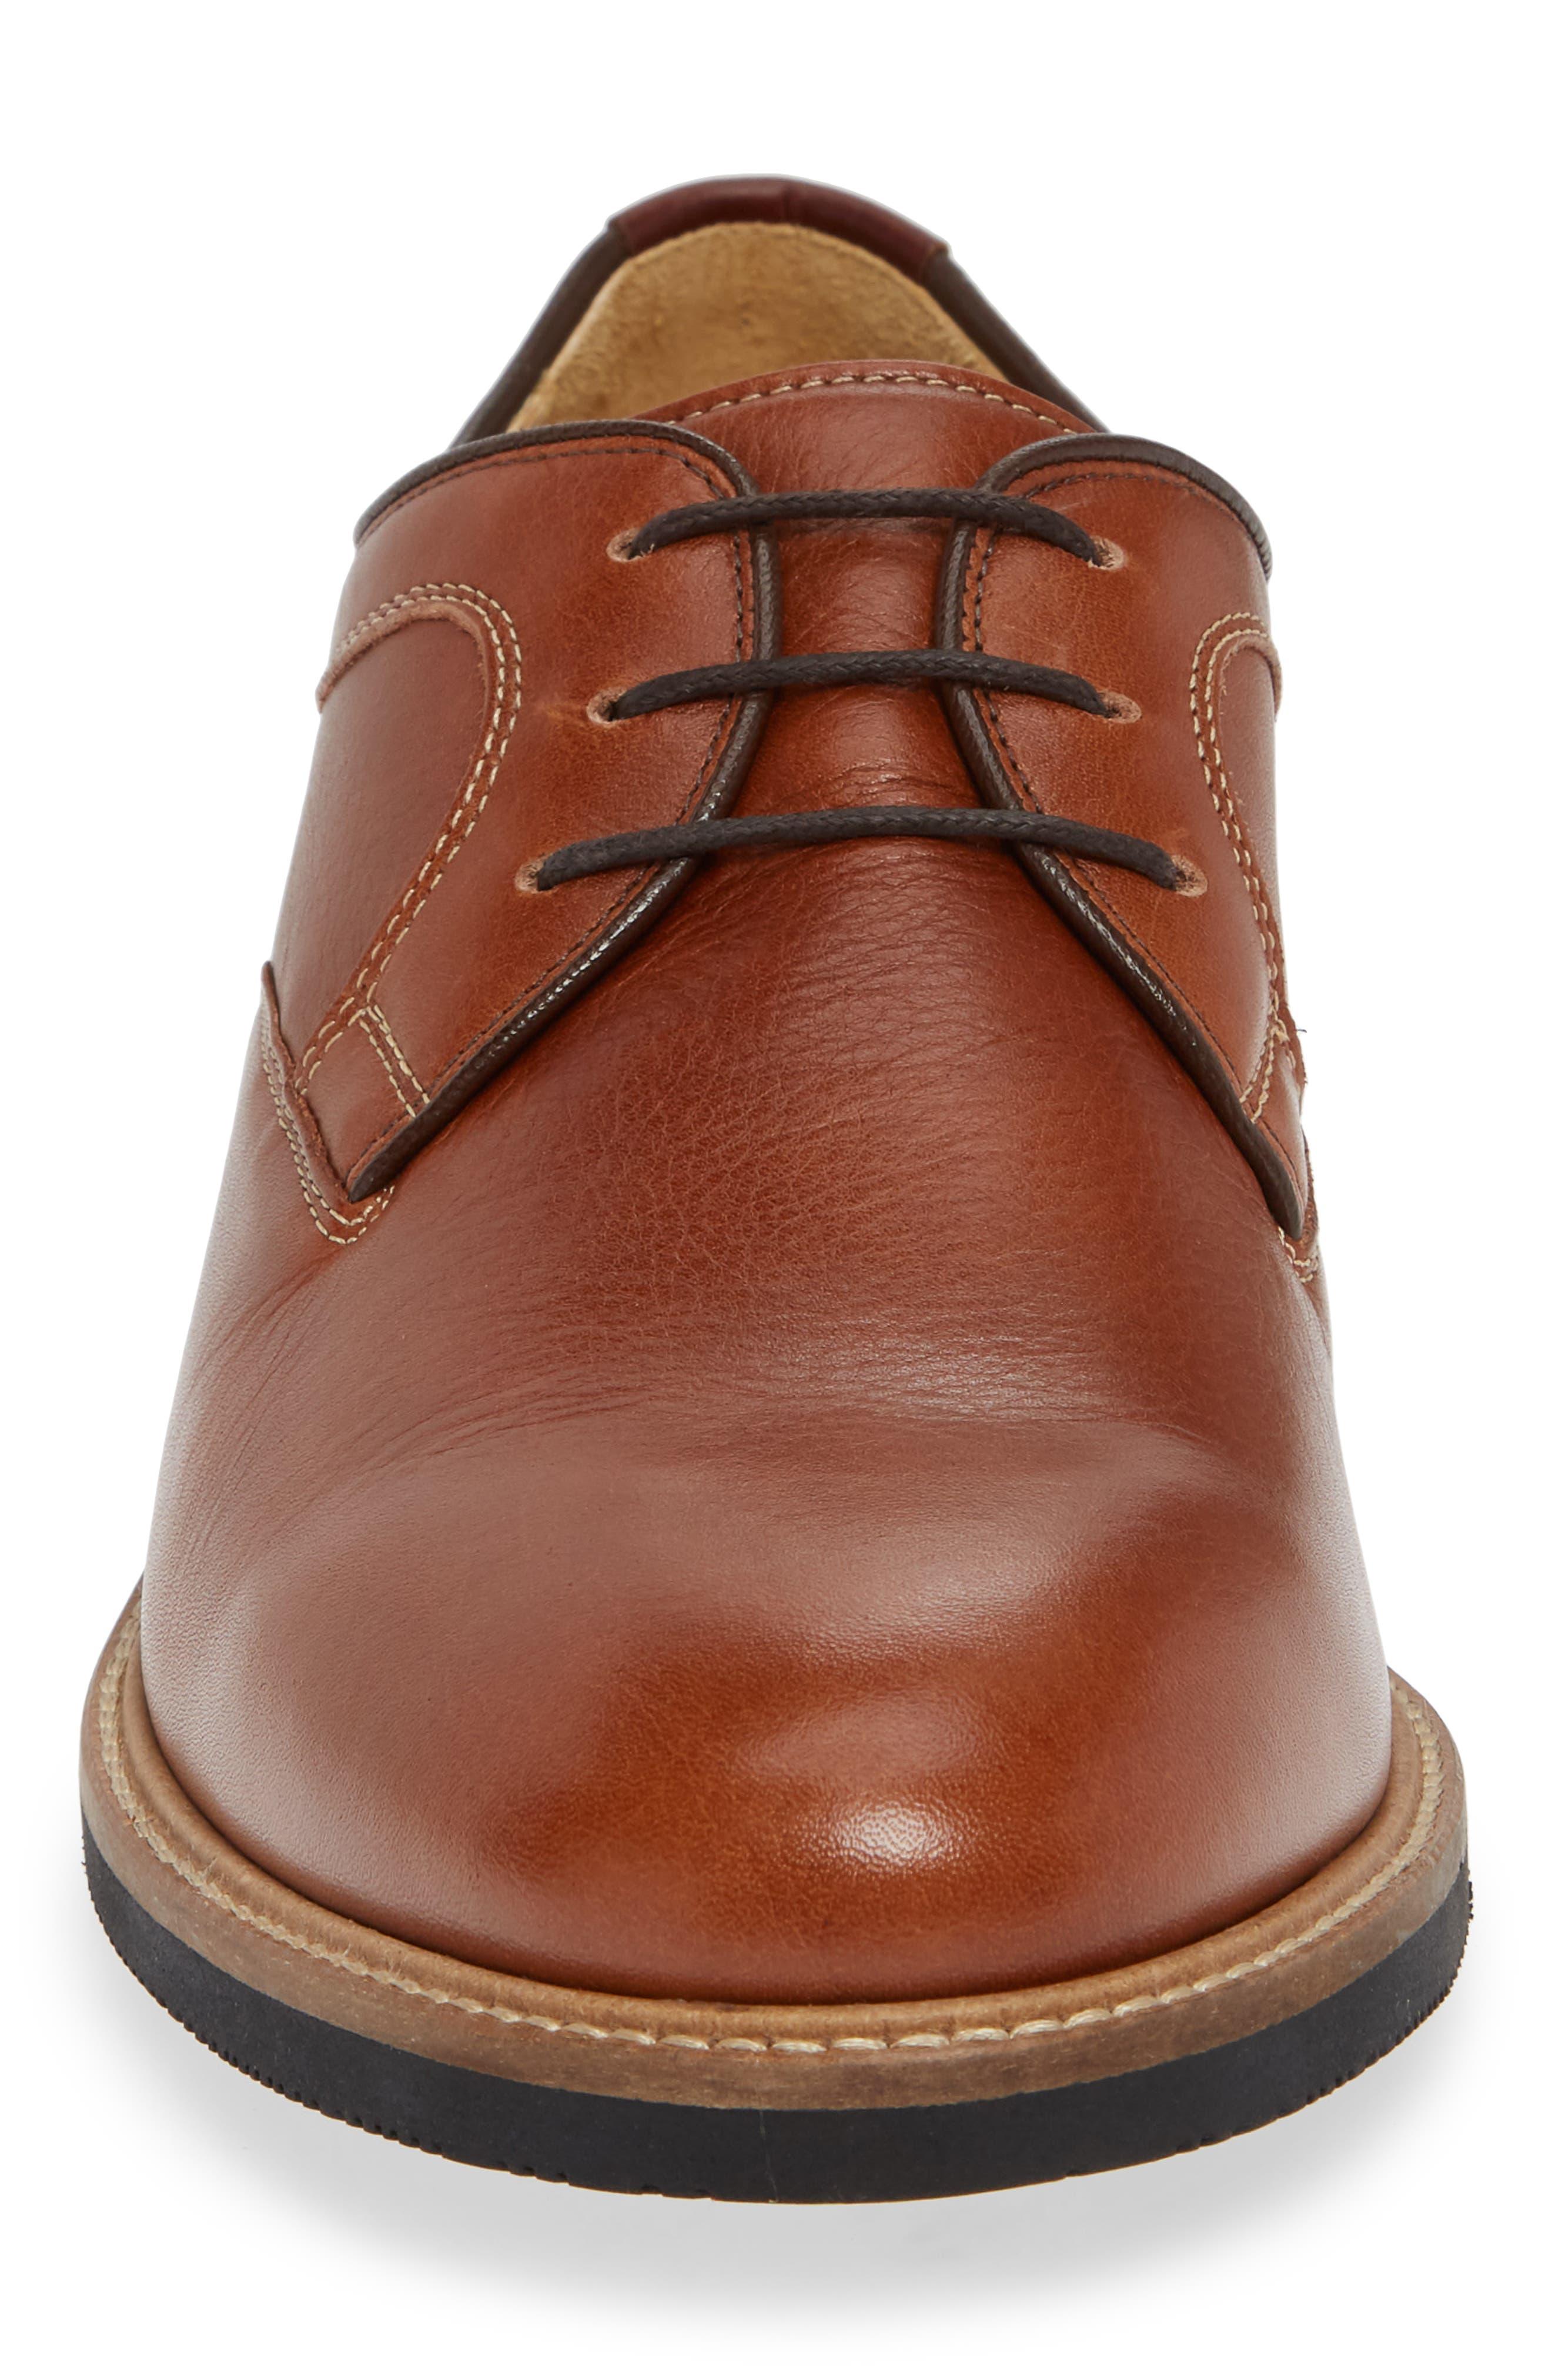 Barlow Plain Toe Derby,                             Alternate thumbnail 4, color,                             Dark Tan Leather